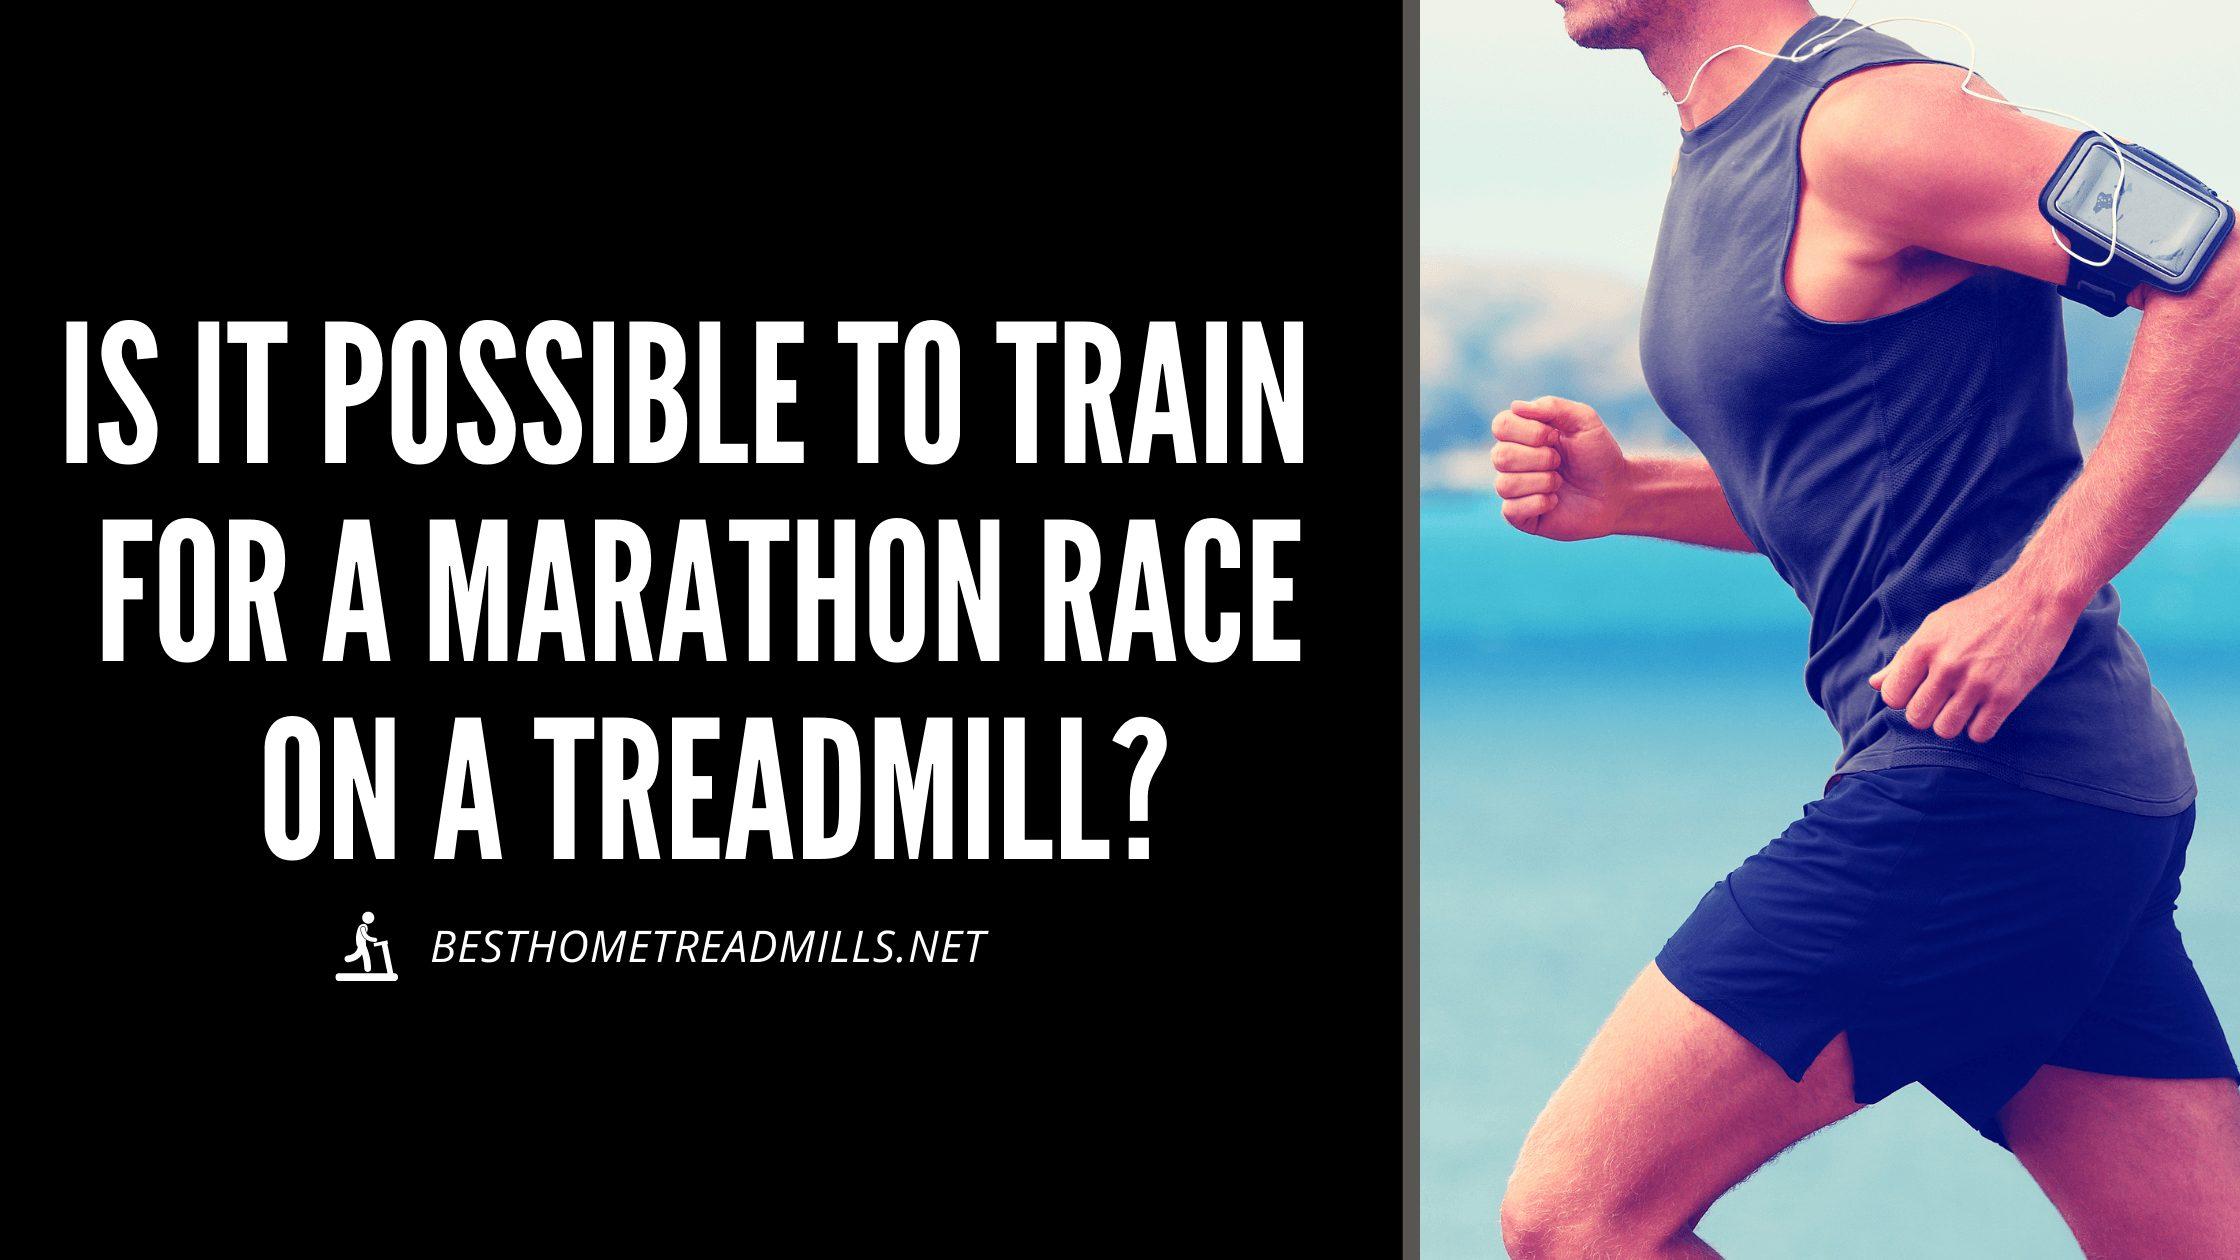 Marathon training on a treadmill - Featured Image